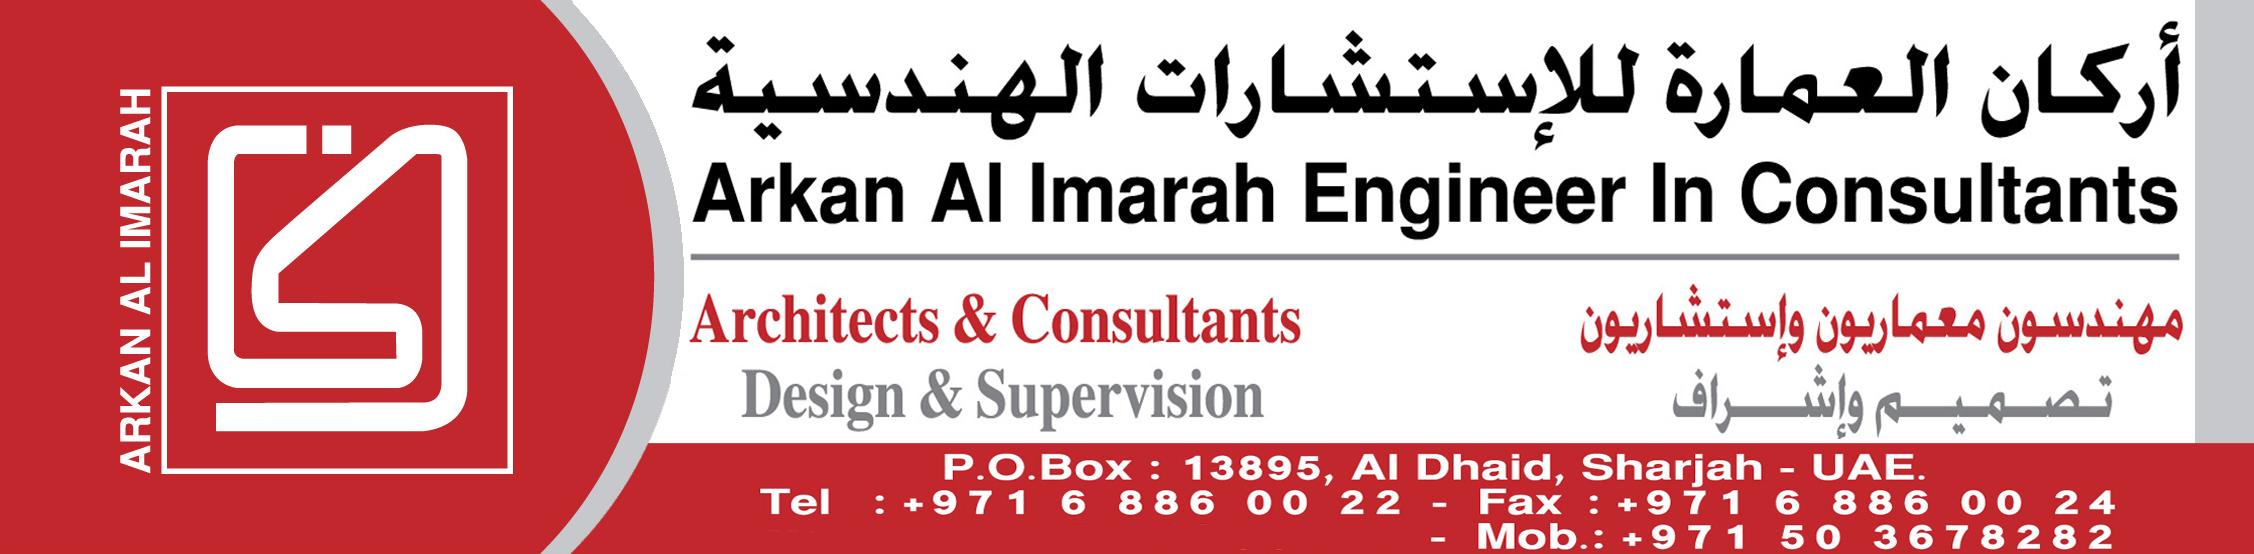 ARKAN AL IMARAH CONSULTANT ENGNIEERING